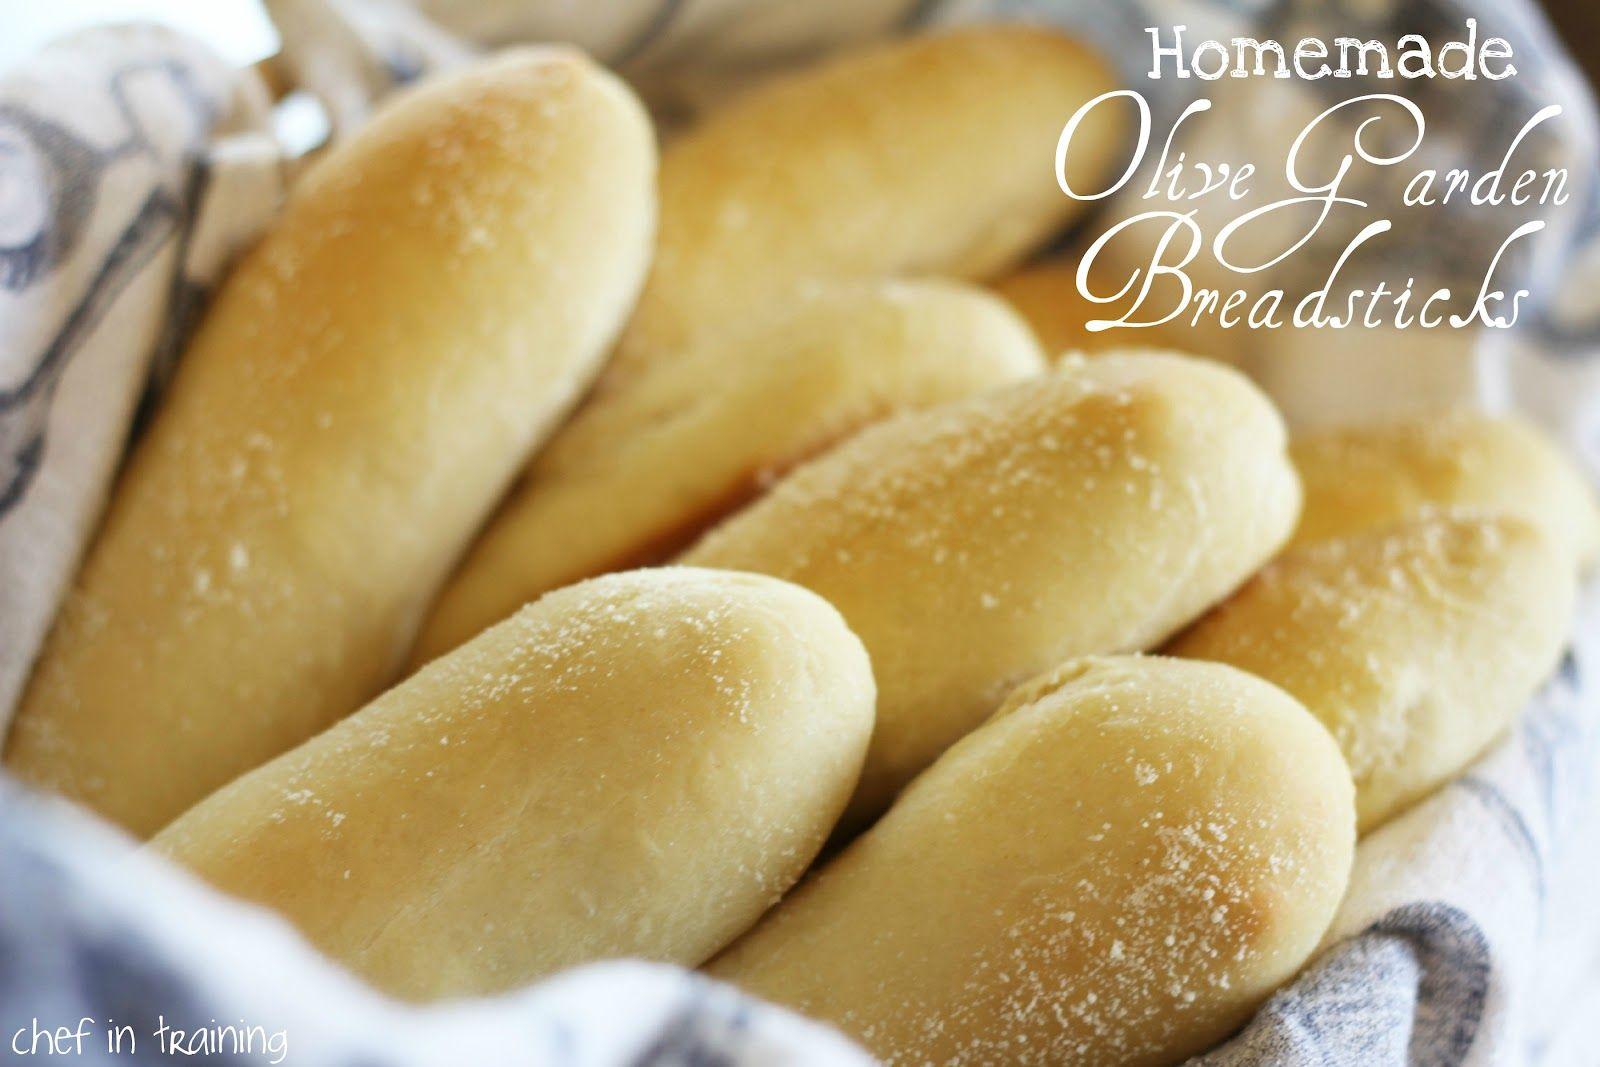 Homemade Olive Garden Breadsticks Recipe Recipes Yummy Food Food